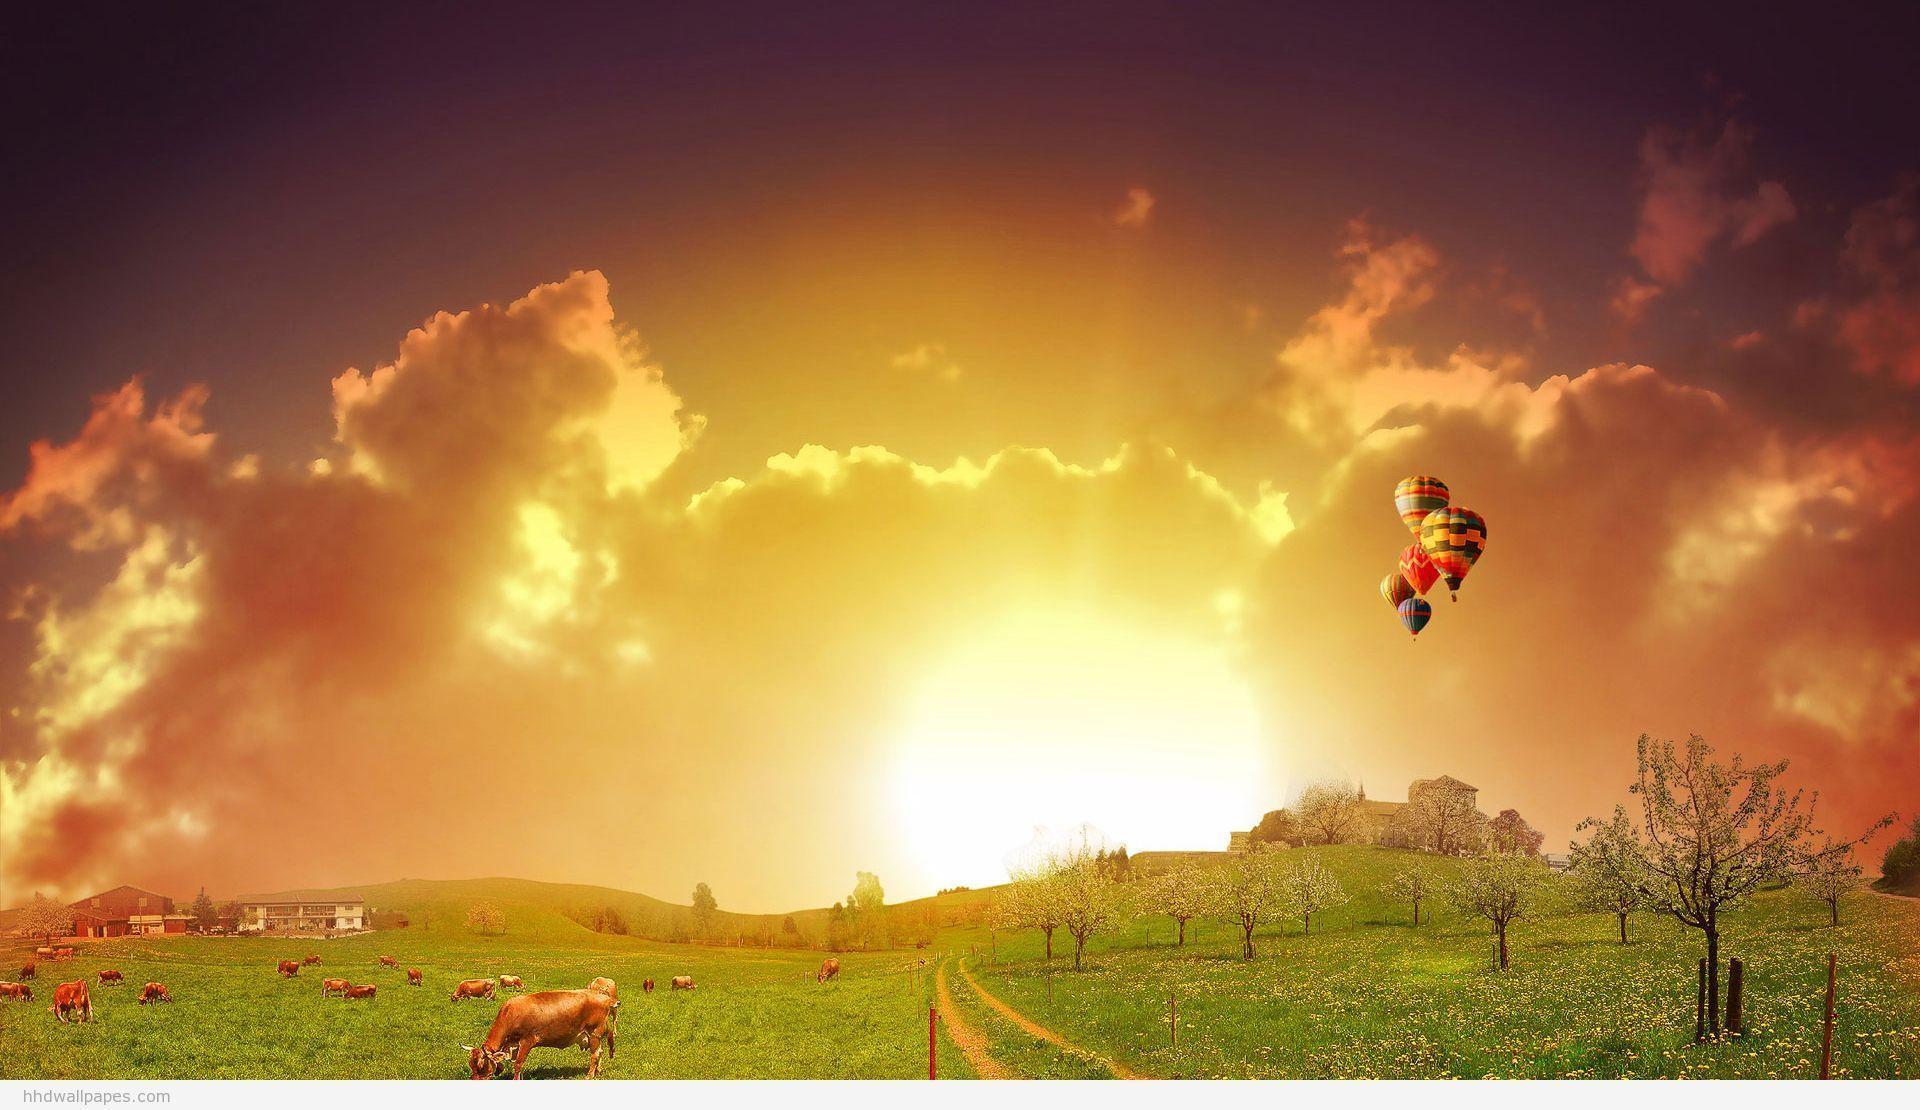 Hd wallpapers for desktop 1080p wallpaper cave - Colorful nature pics ...